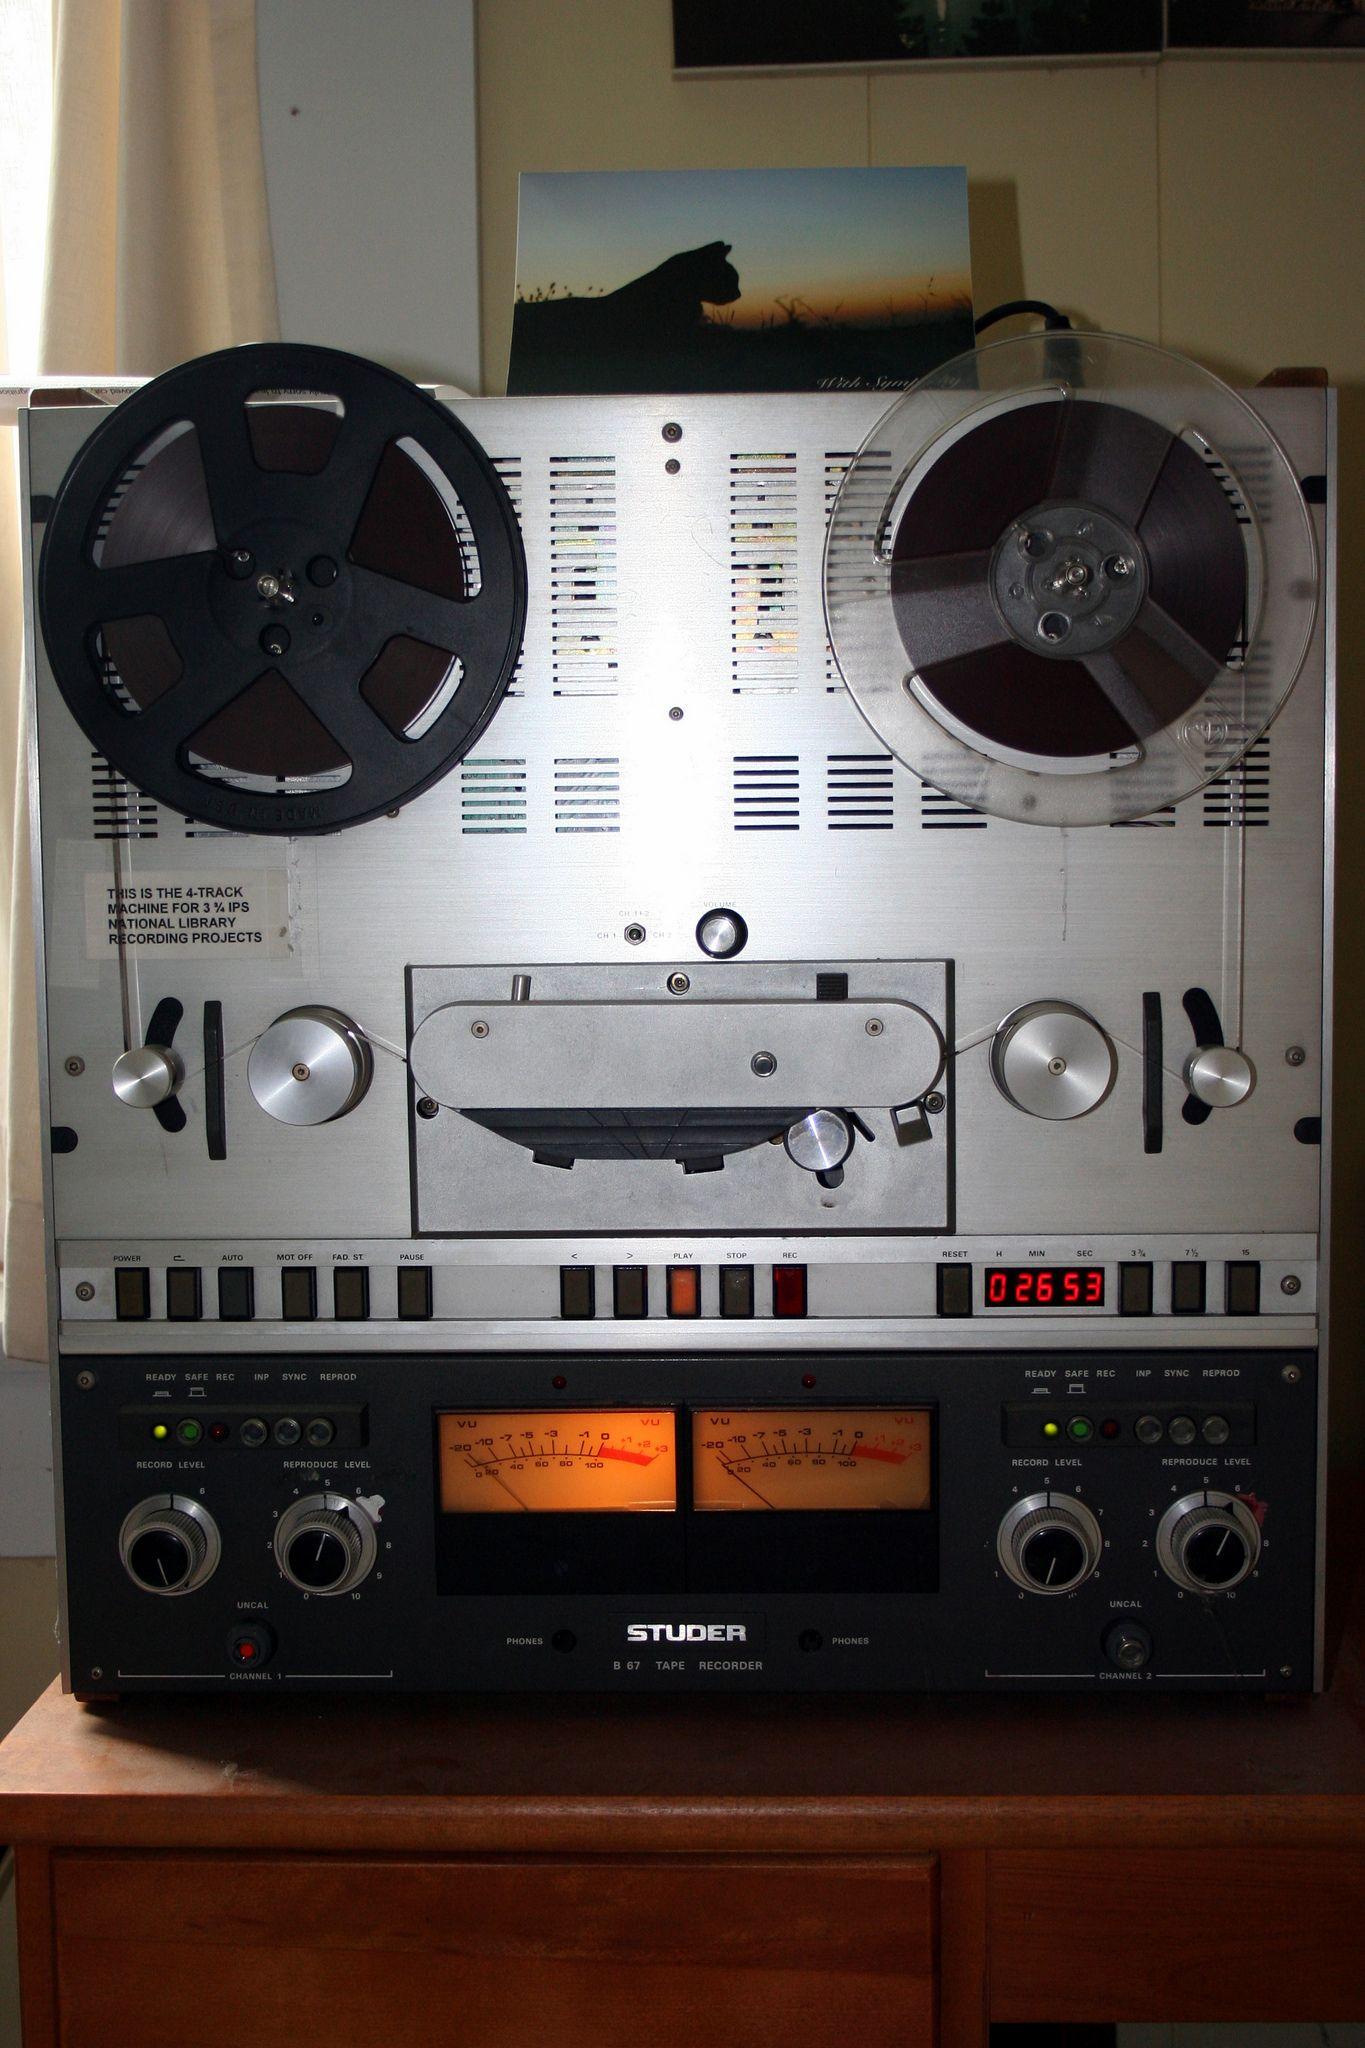 Studer B 67_8676 у 2019 р    Old Electronics & Appliances